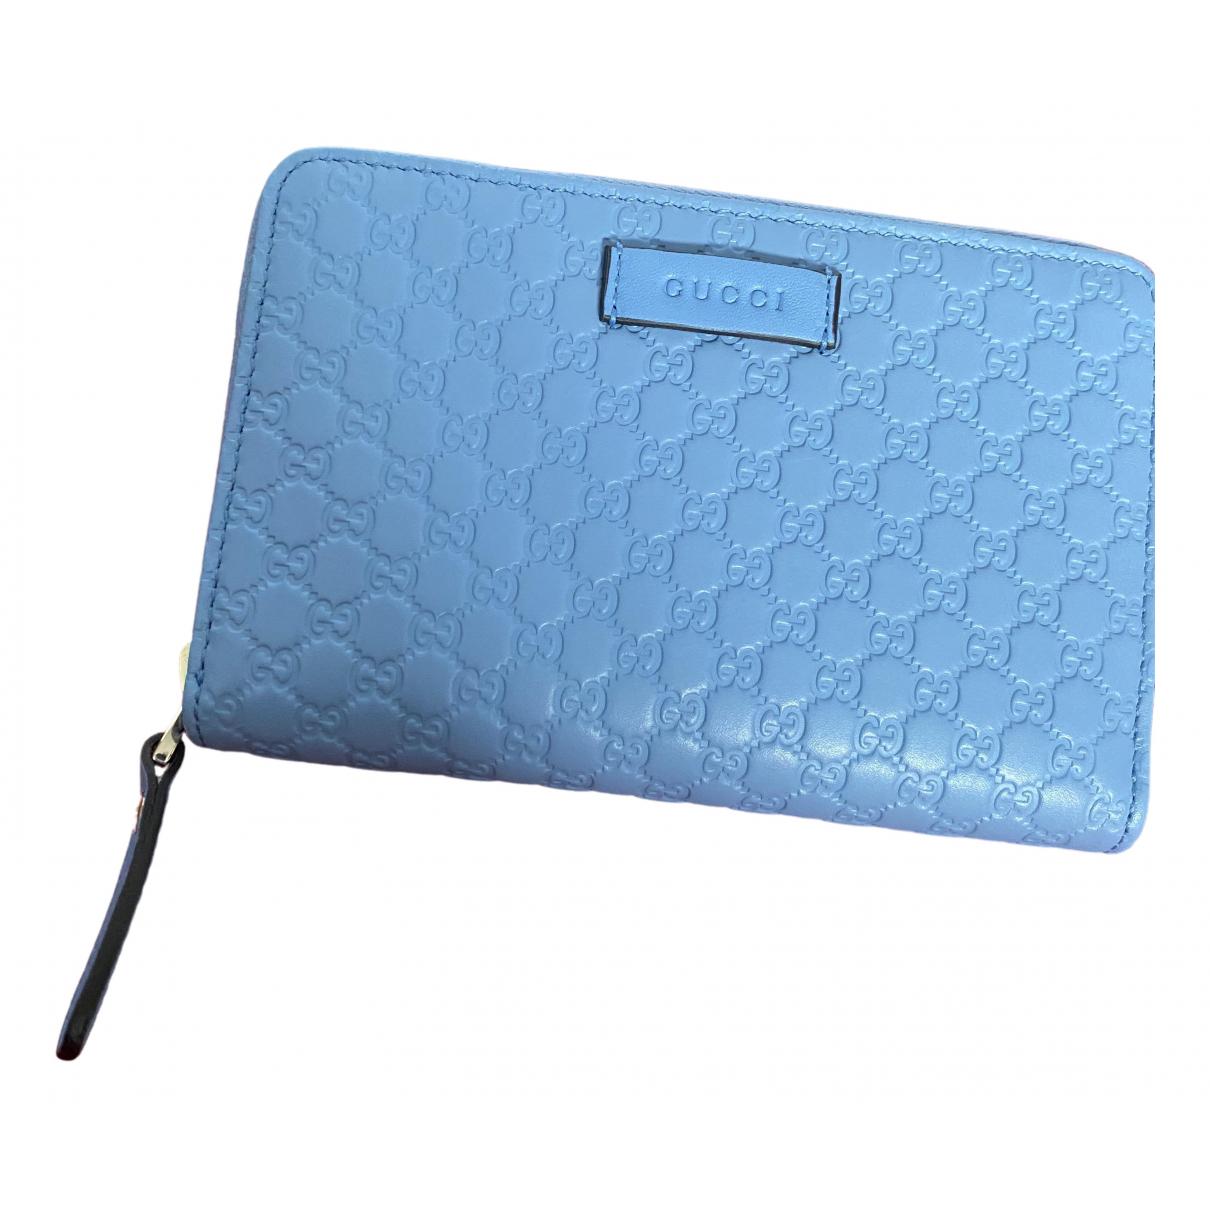 Gucci Continental Portemonnaie in  Blau Leder